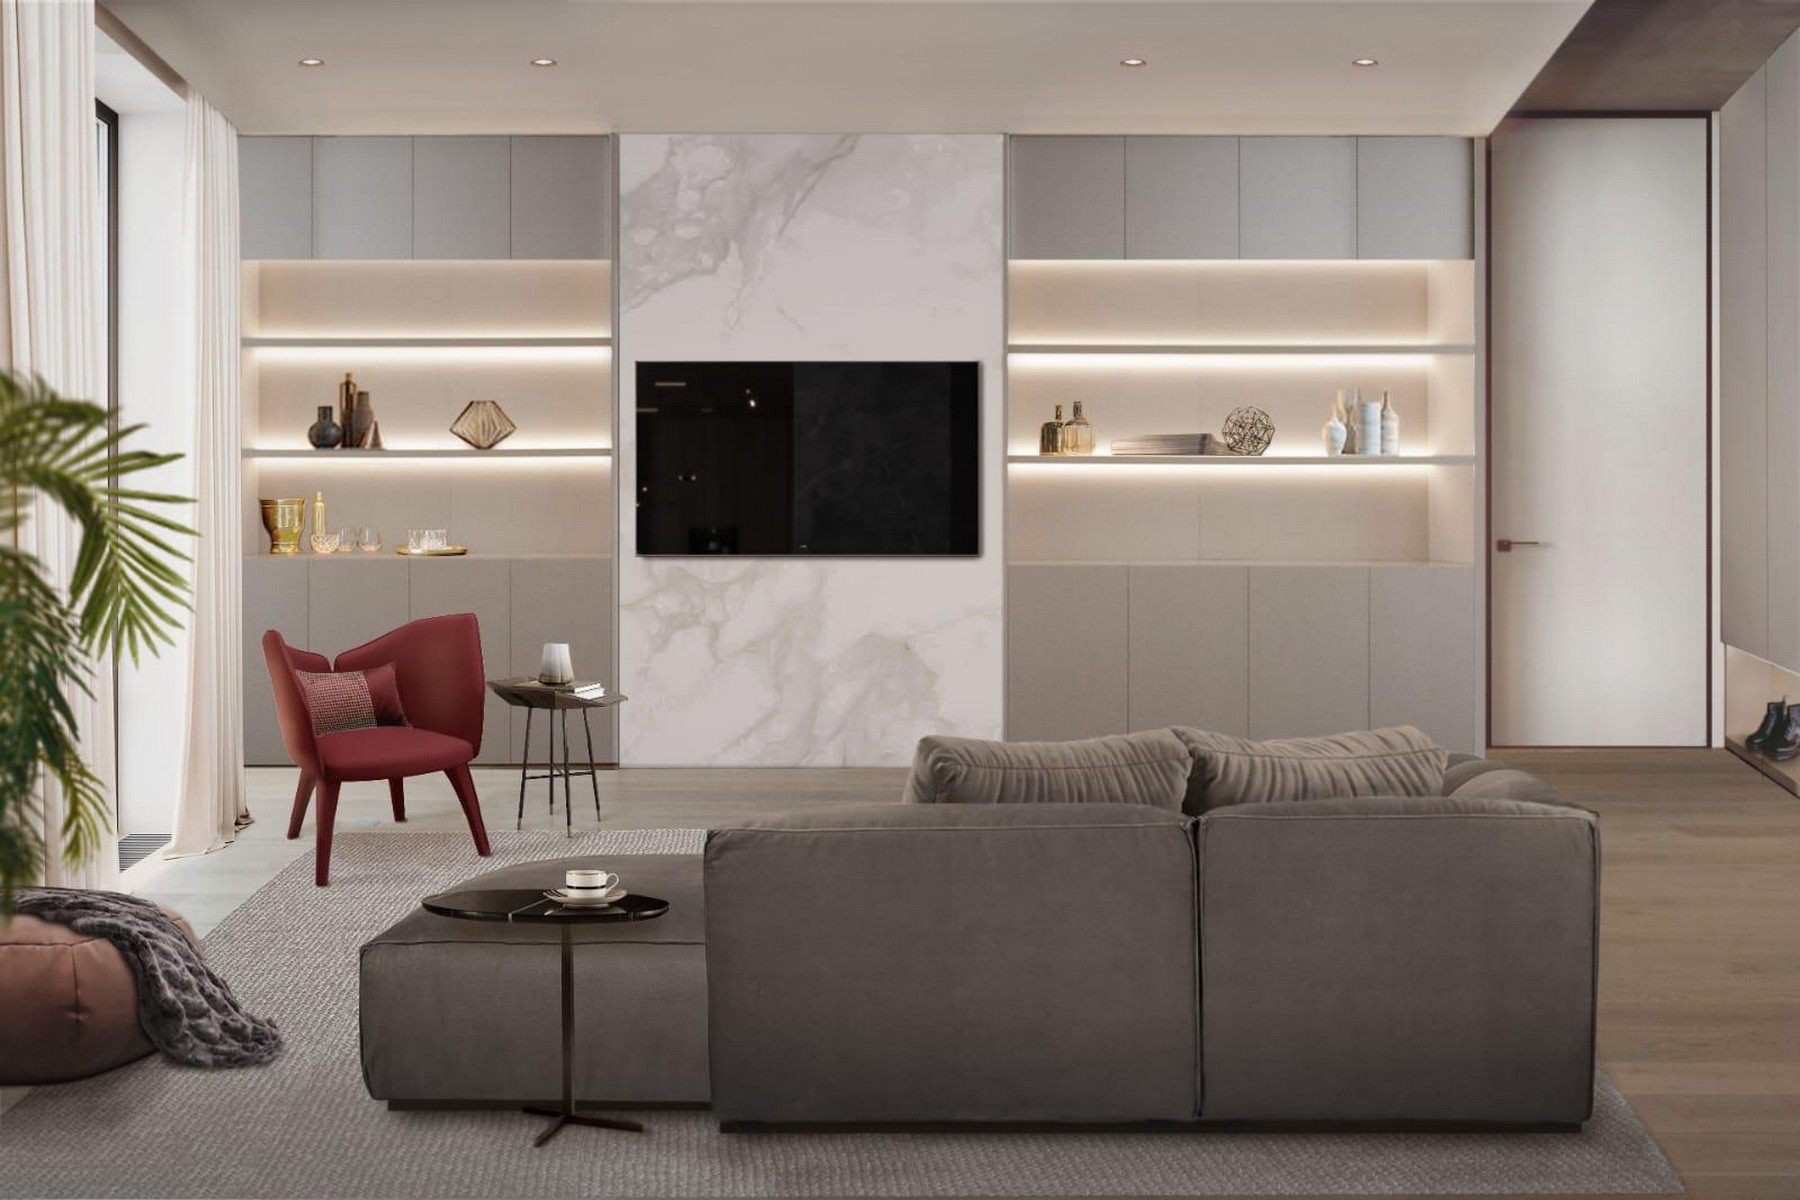 Appartamento in Vendita a Desenzano Del Garda via pola